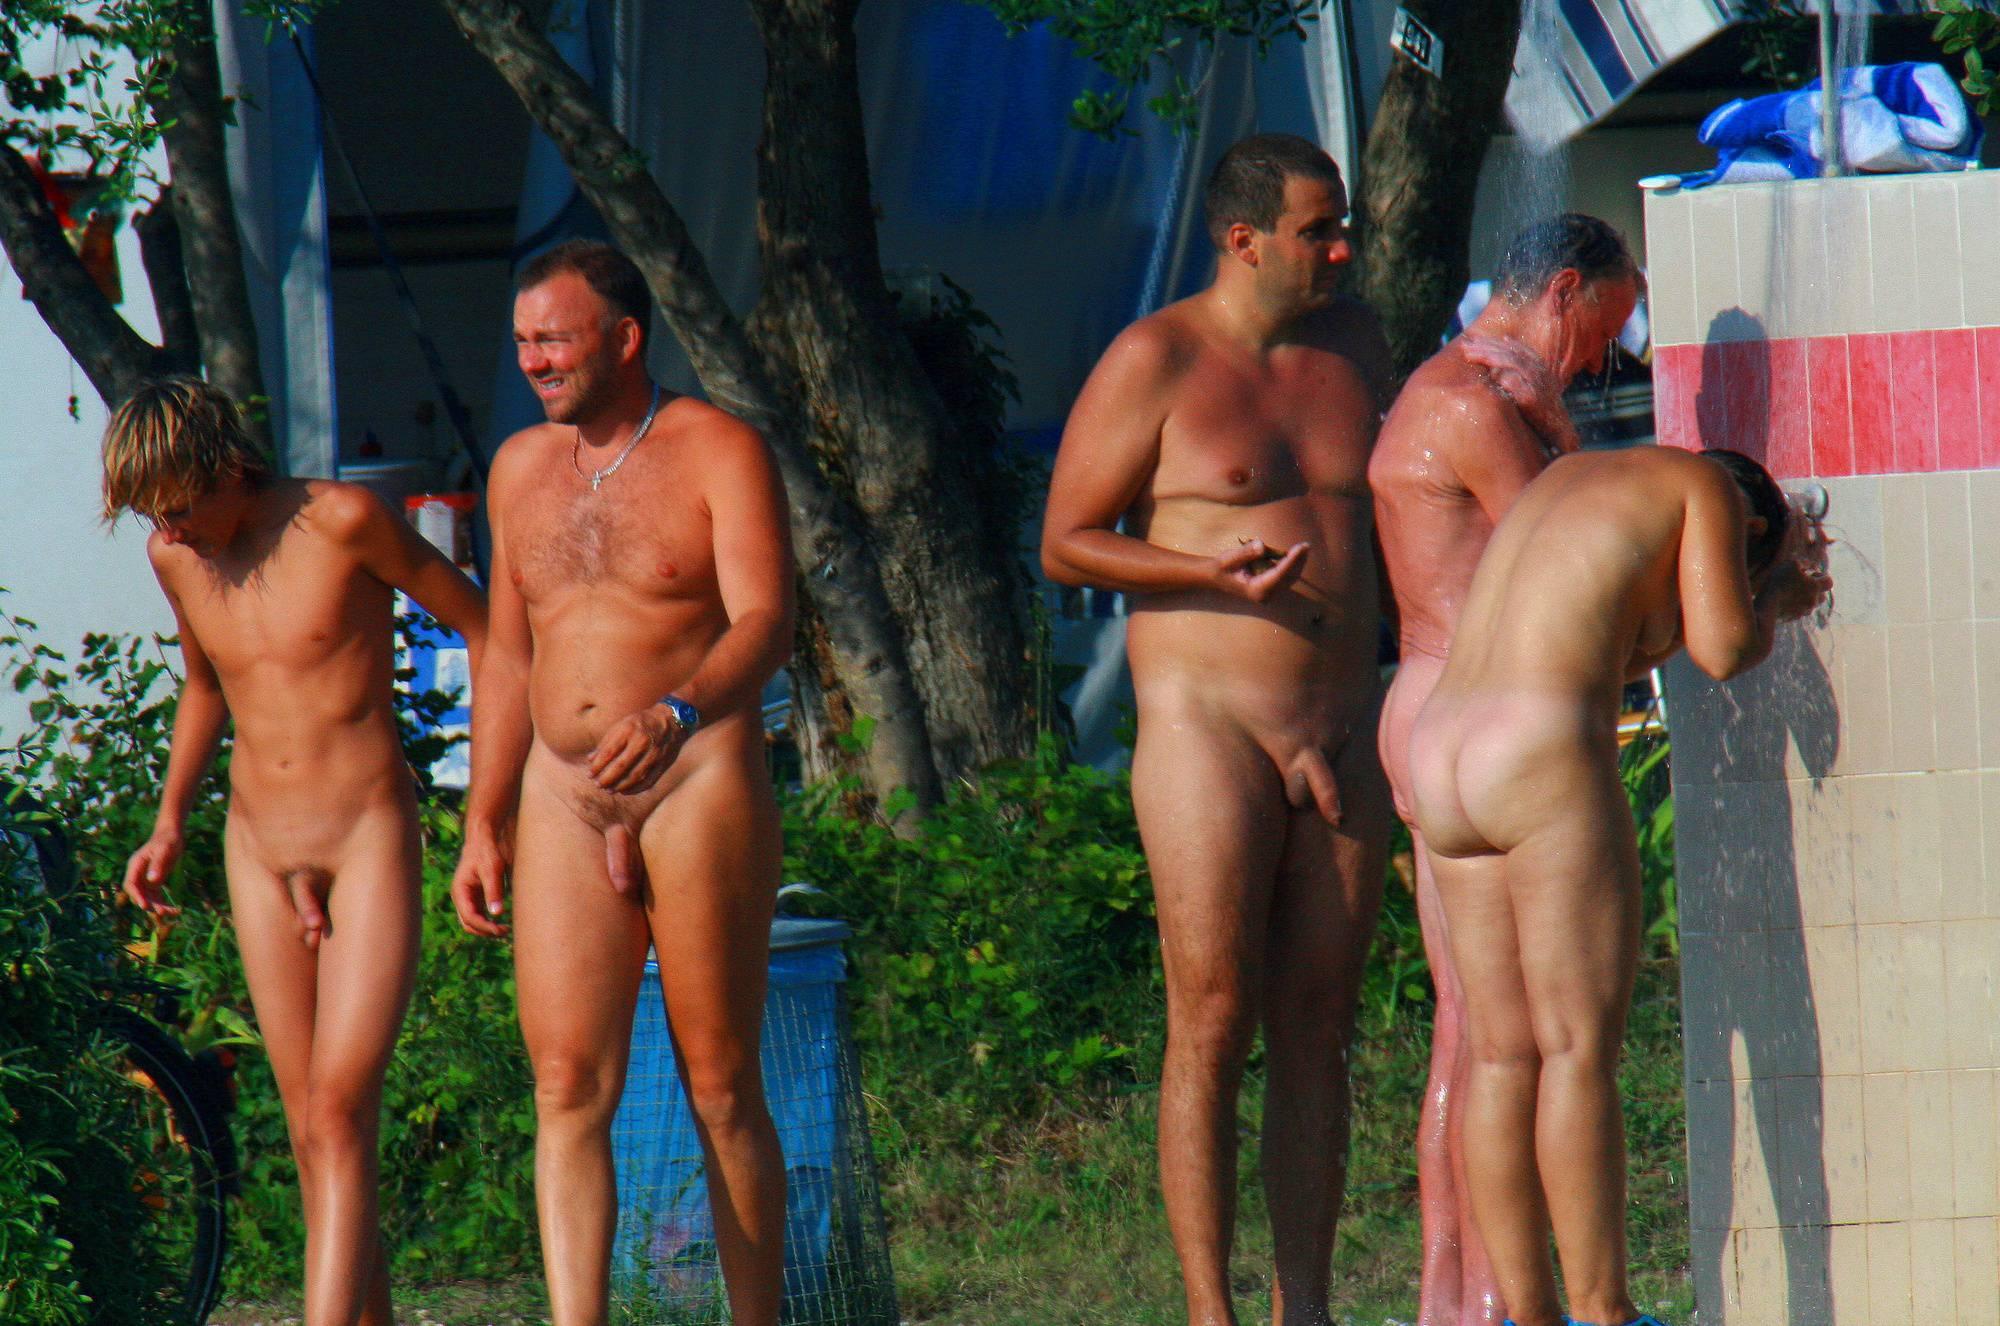 Nudist Photos Ula FKK Family Shower Site - 2